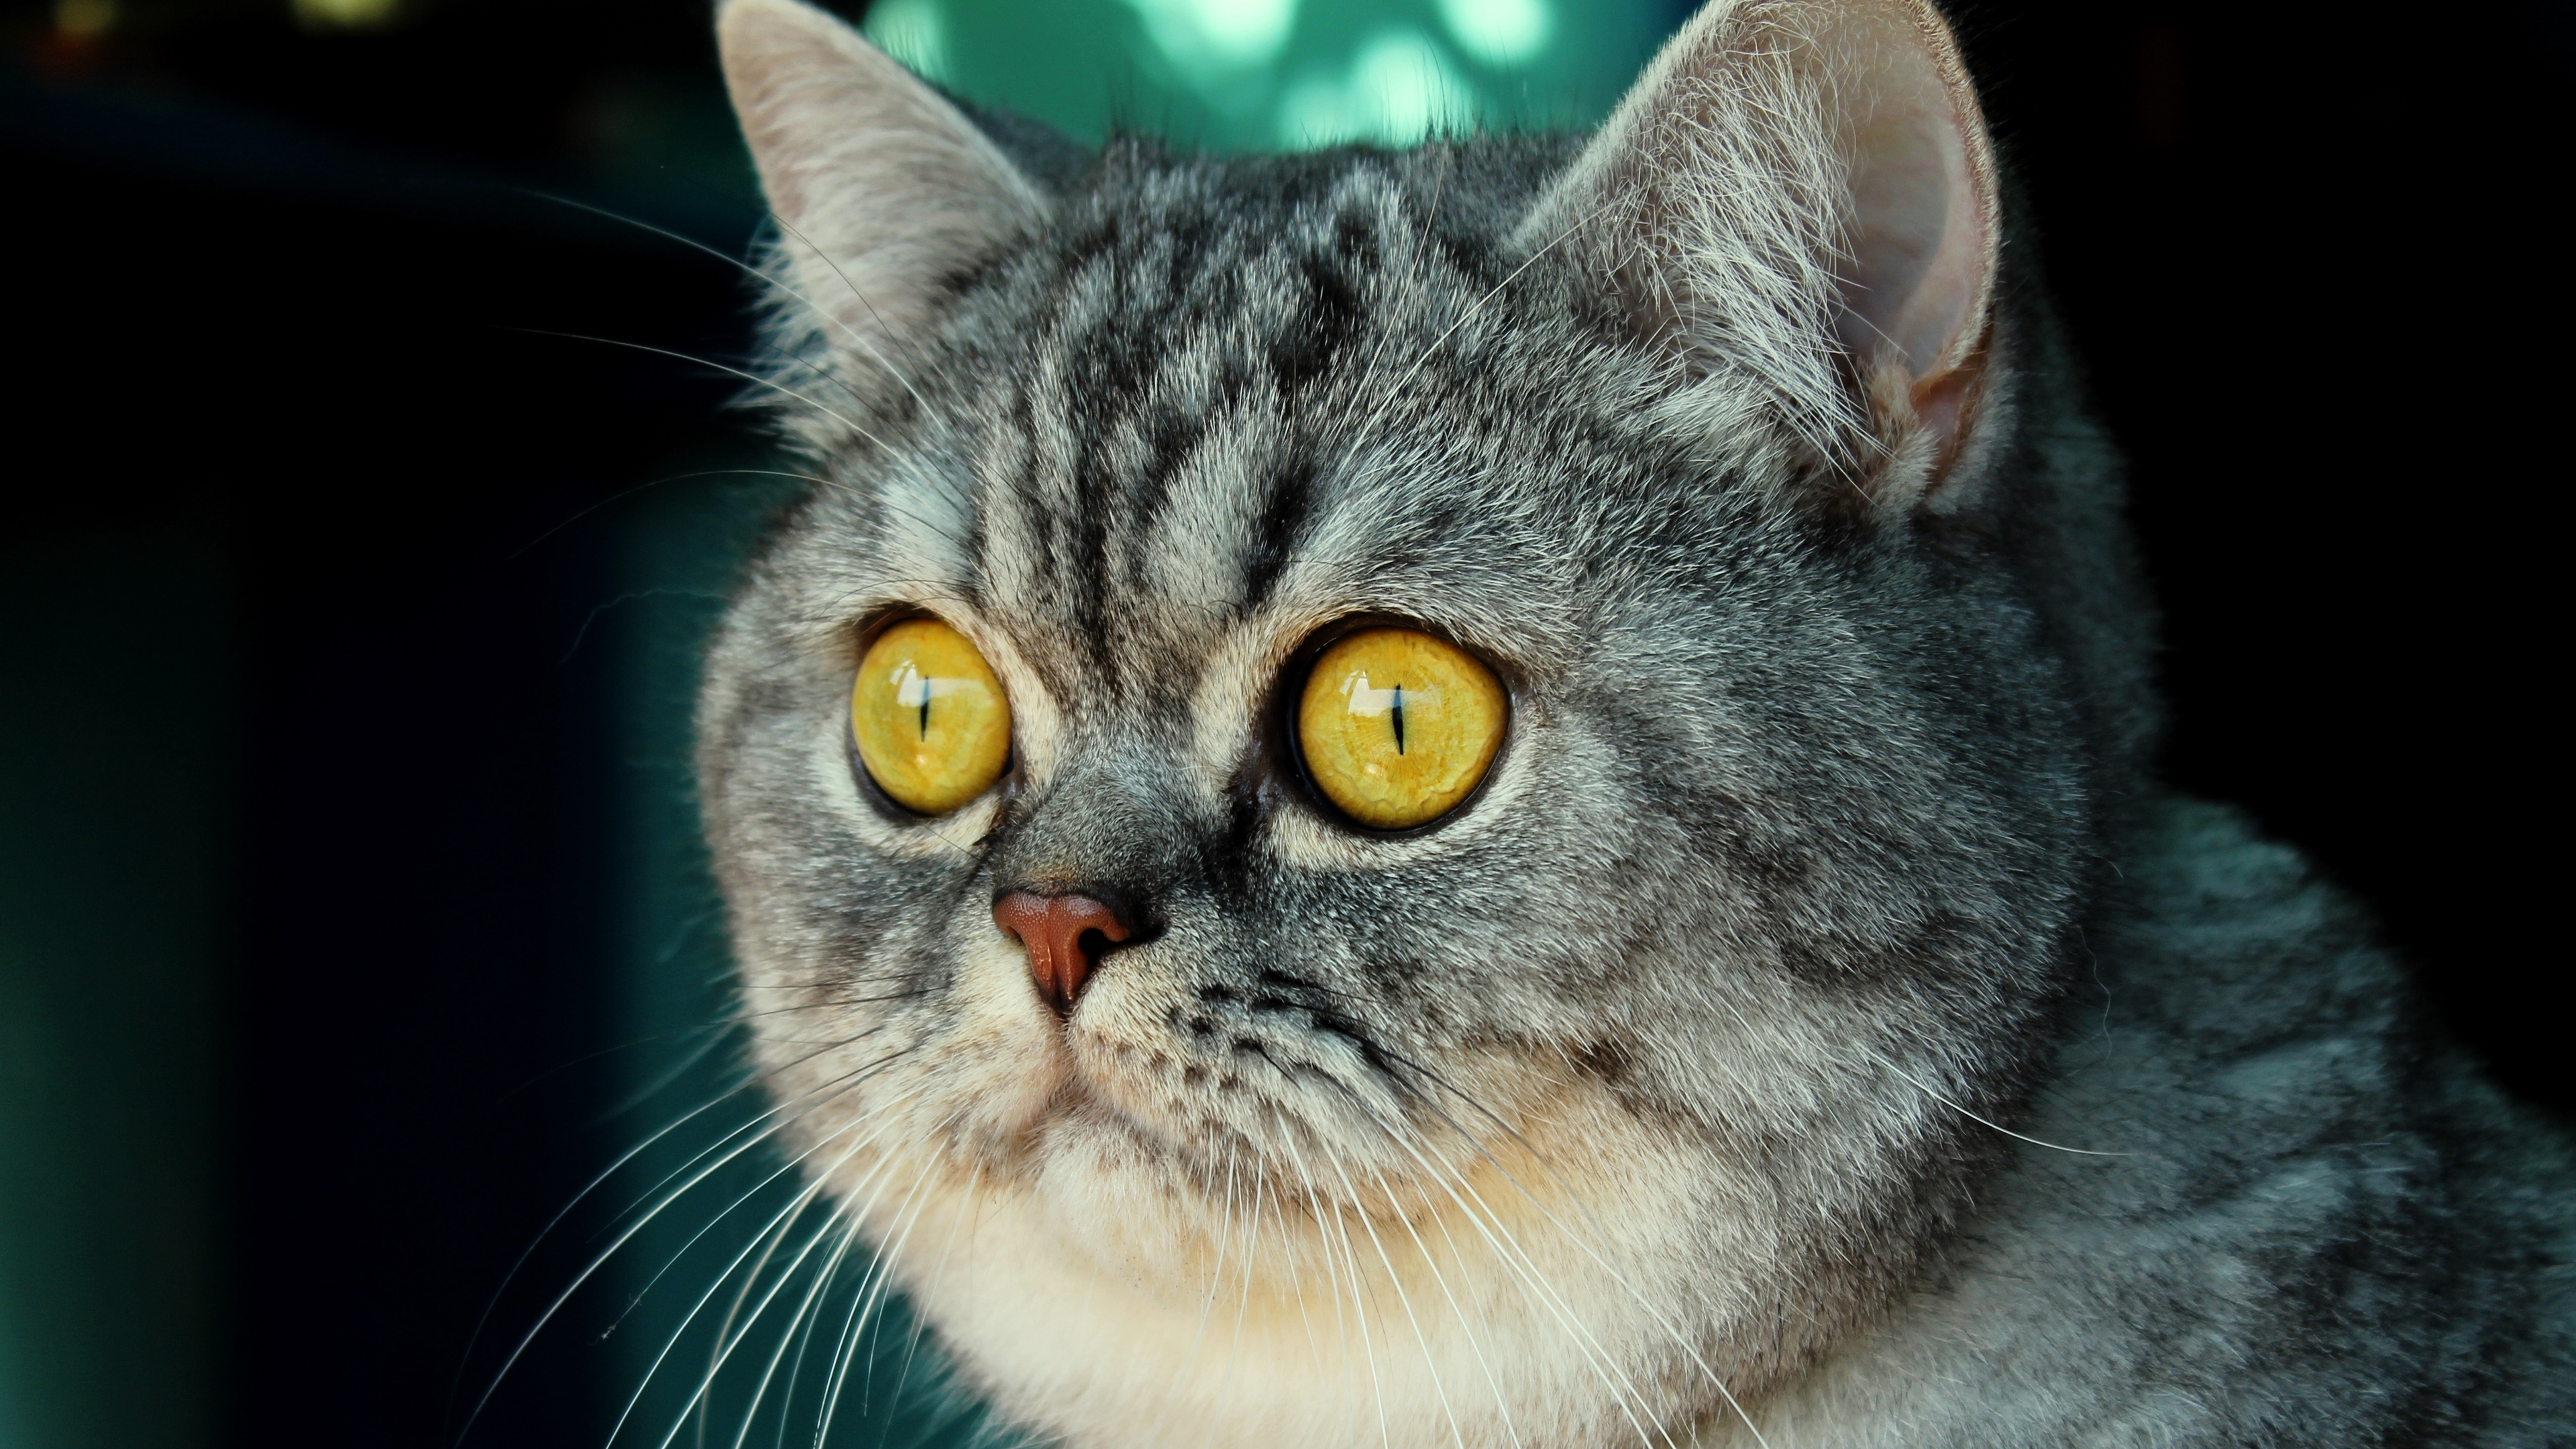 cat muzzle fear striped look 4k 1542241693 - cat, muzzle, fear, striped, look 4k - muzzle, fear, Cat